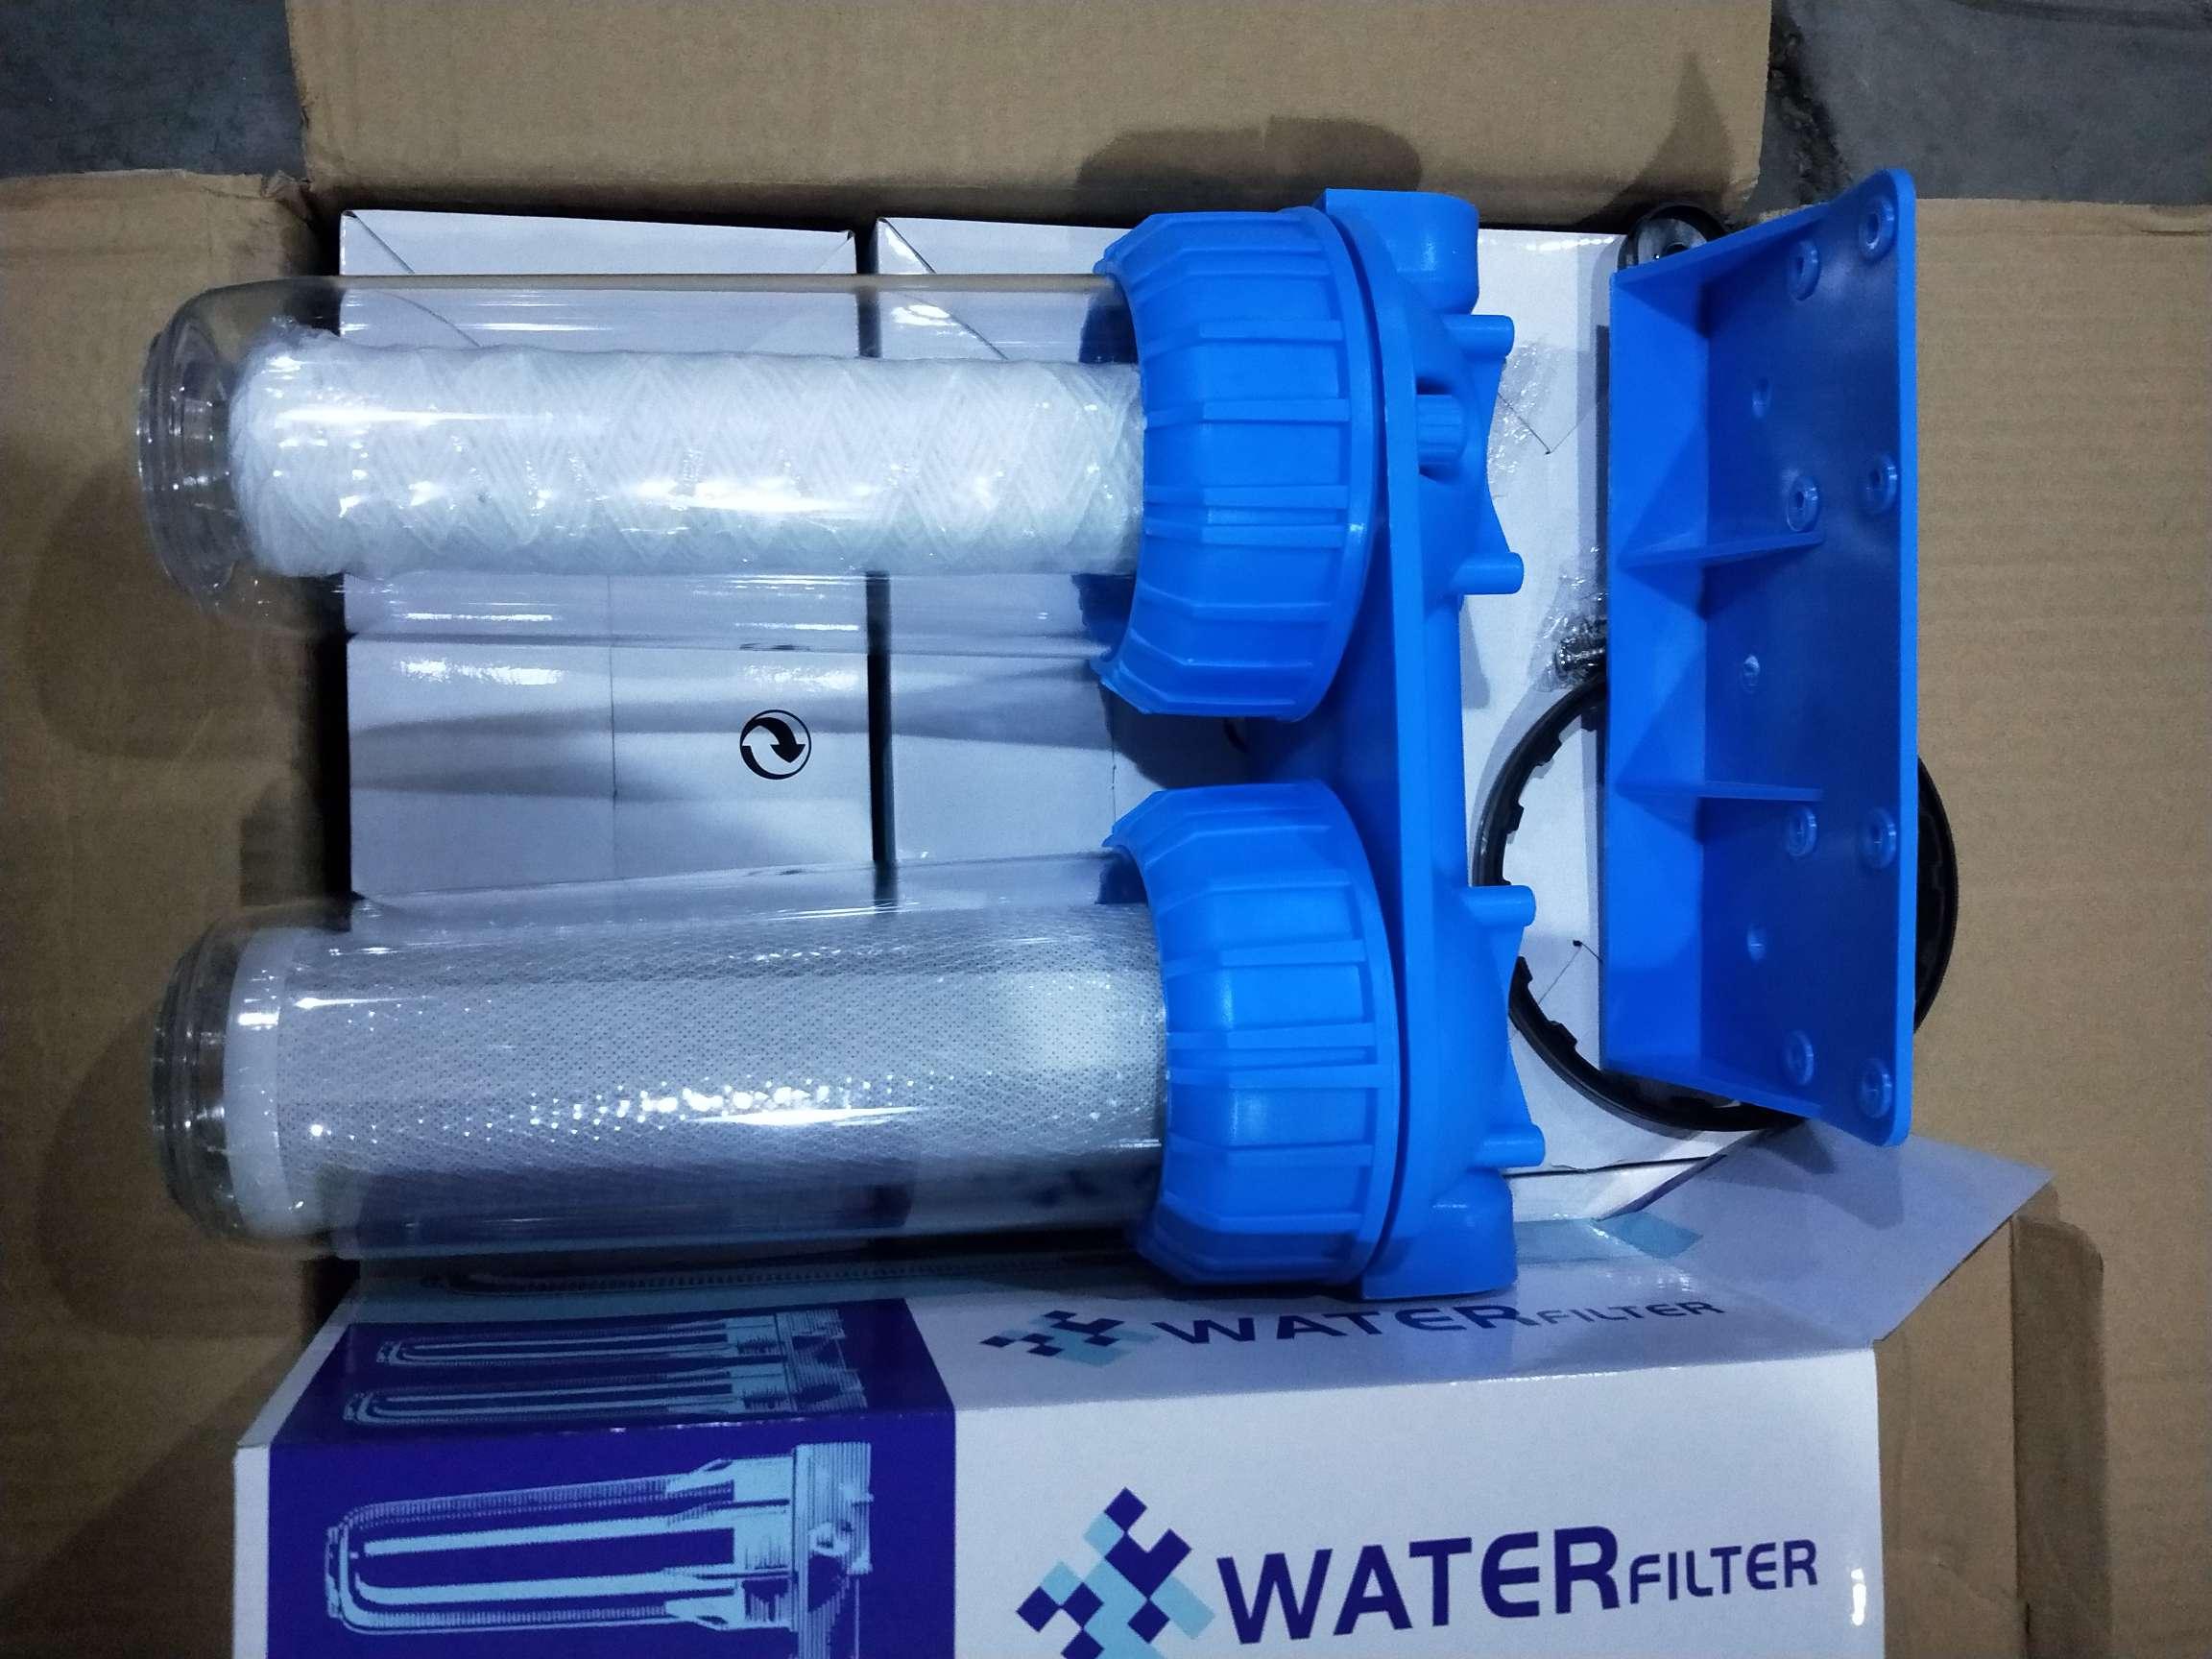 仿意式俄罗斯净水器二级三级蓝色透明瓶 water purifucation filter 2 two 3 stage